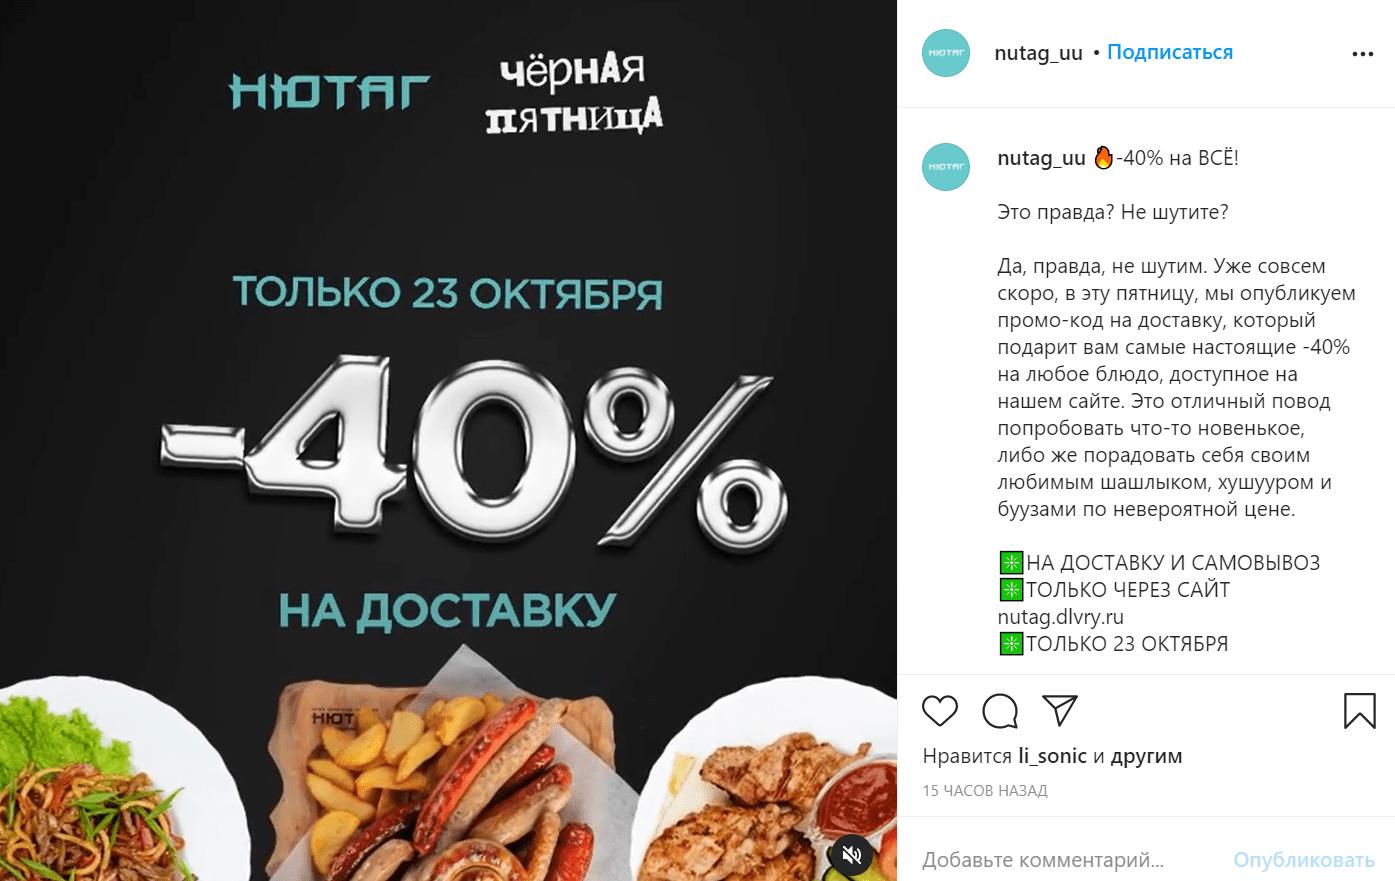 Анонс промокода на скидку в Instagram